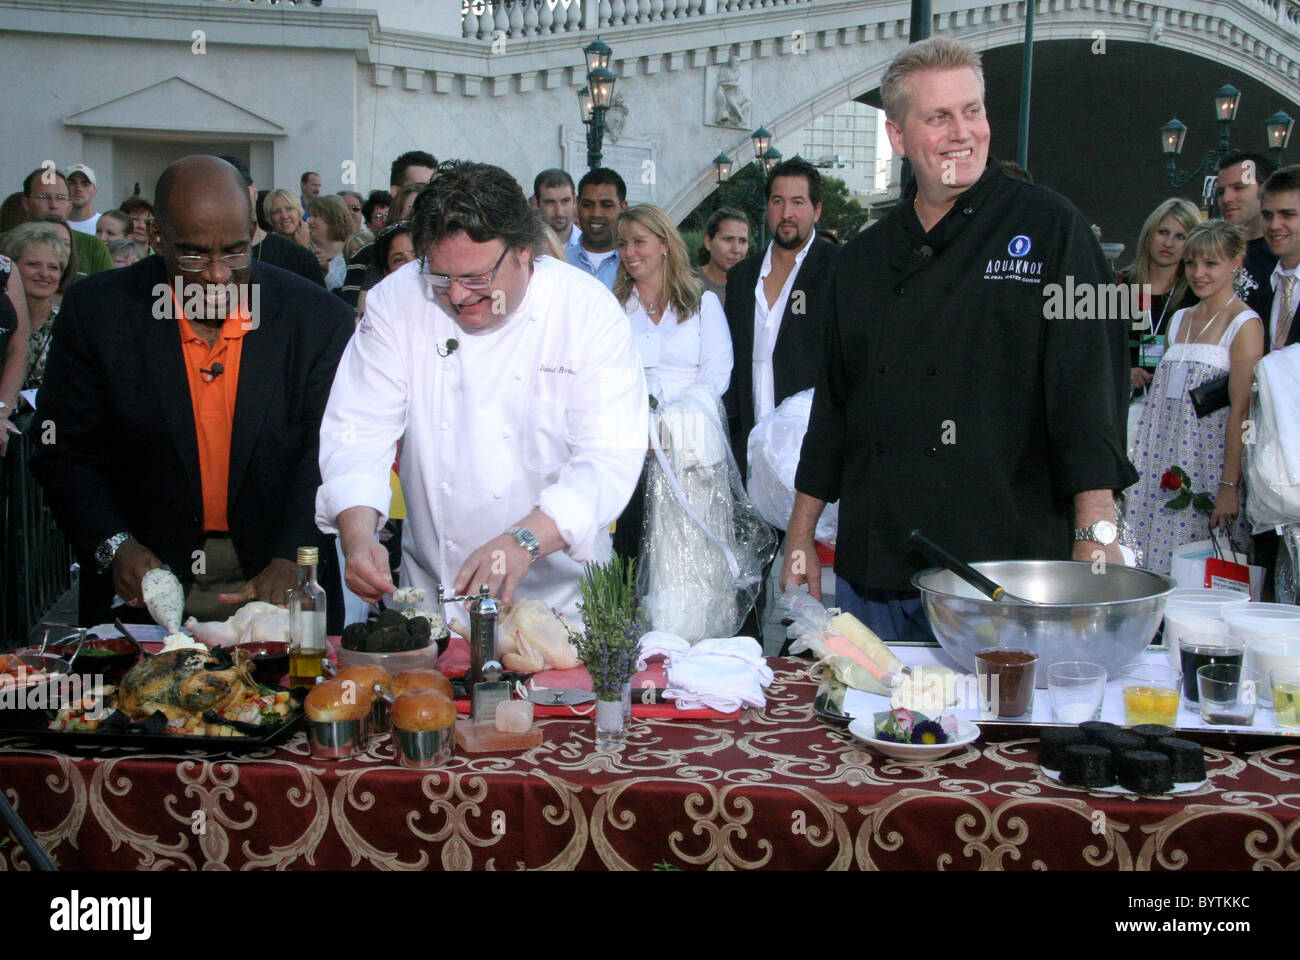 David Burke Chef Stockfotos & David Burke Chef Bilder - Alamy